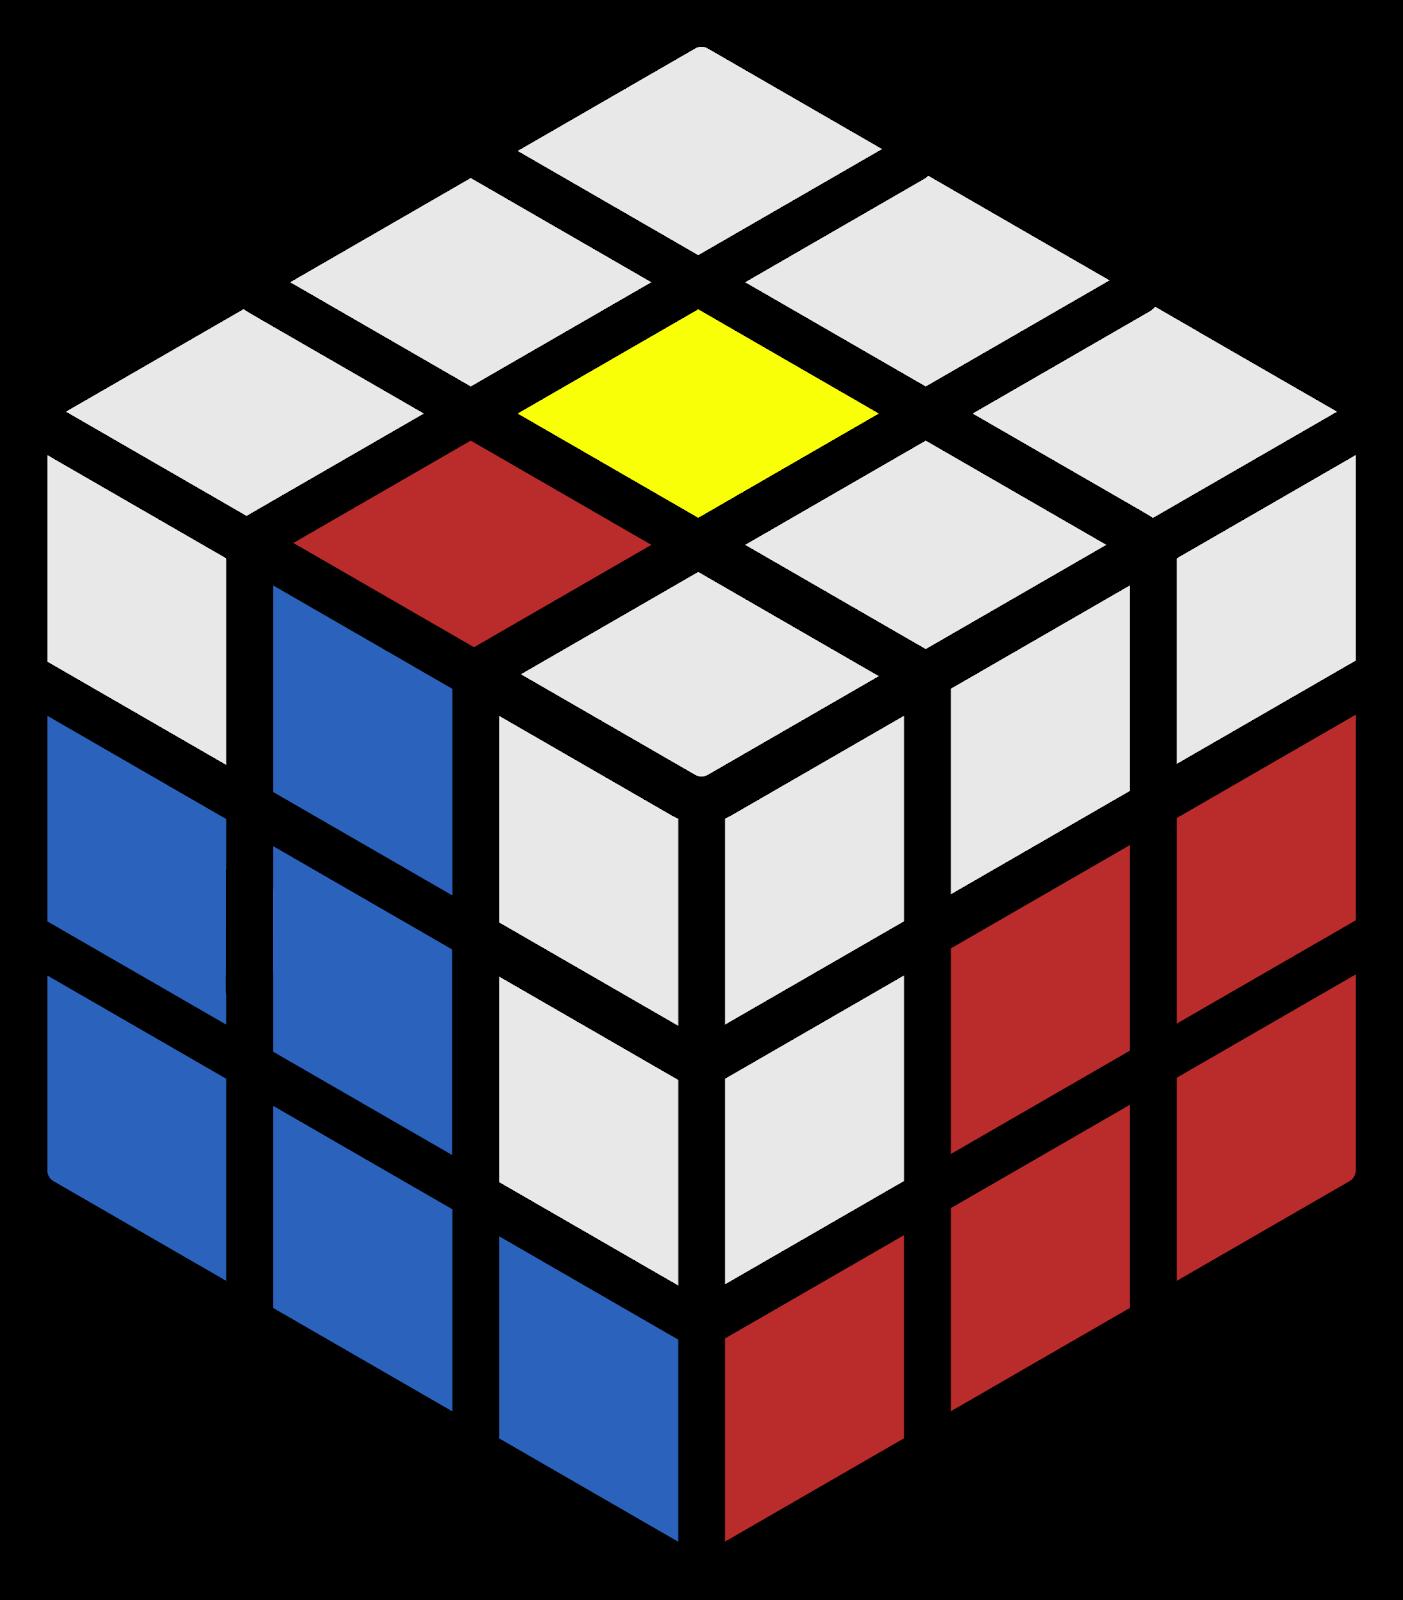 rumus middle layer rubik 3x3